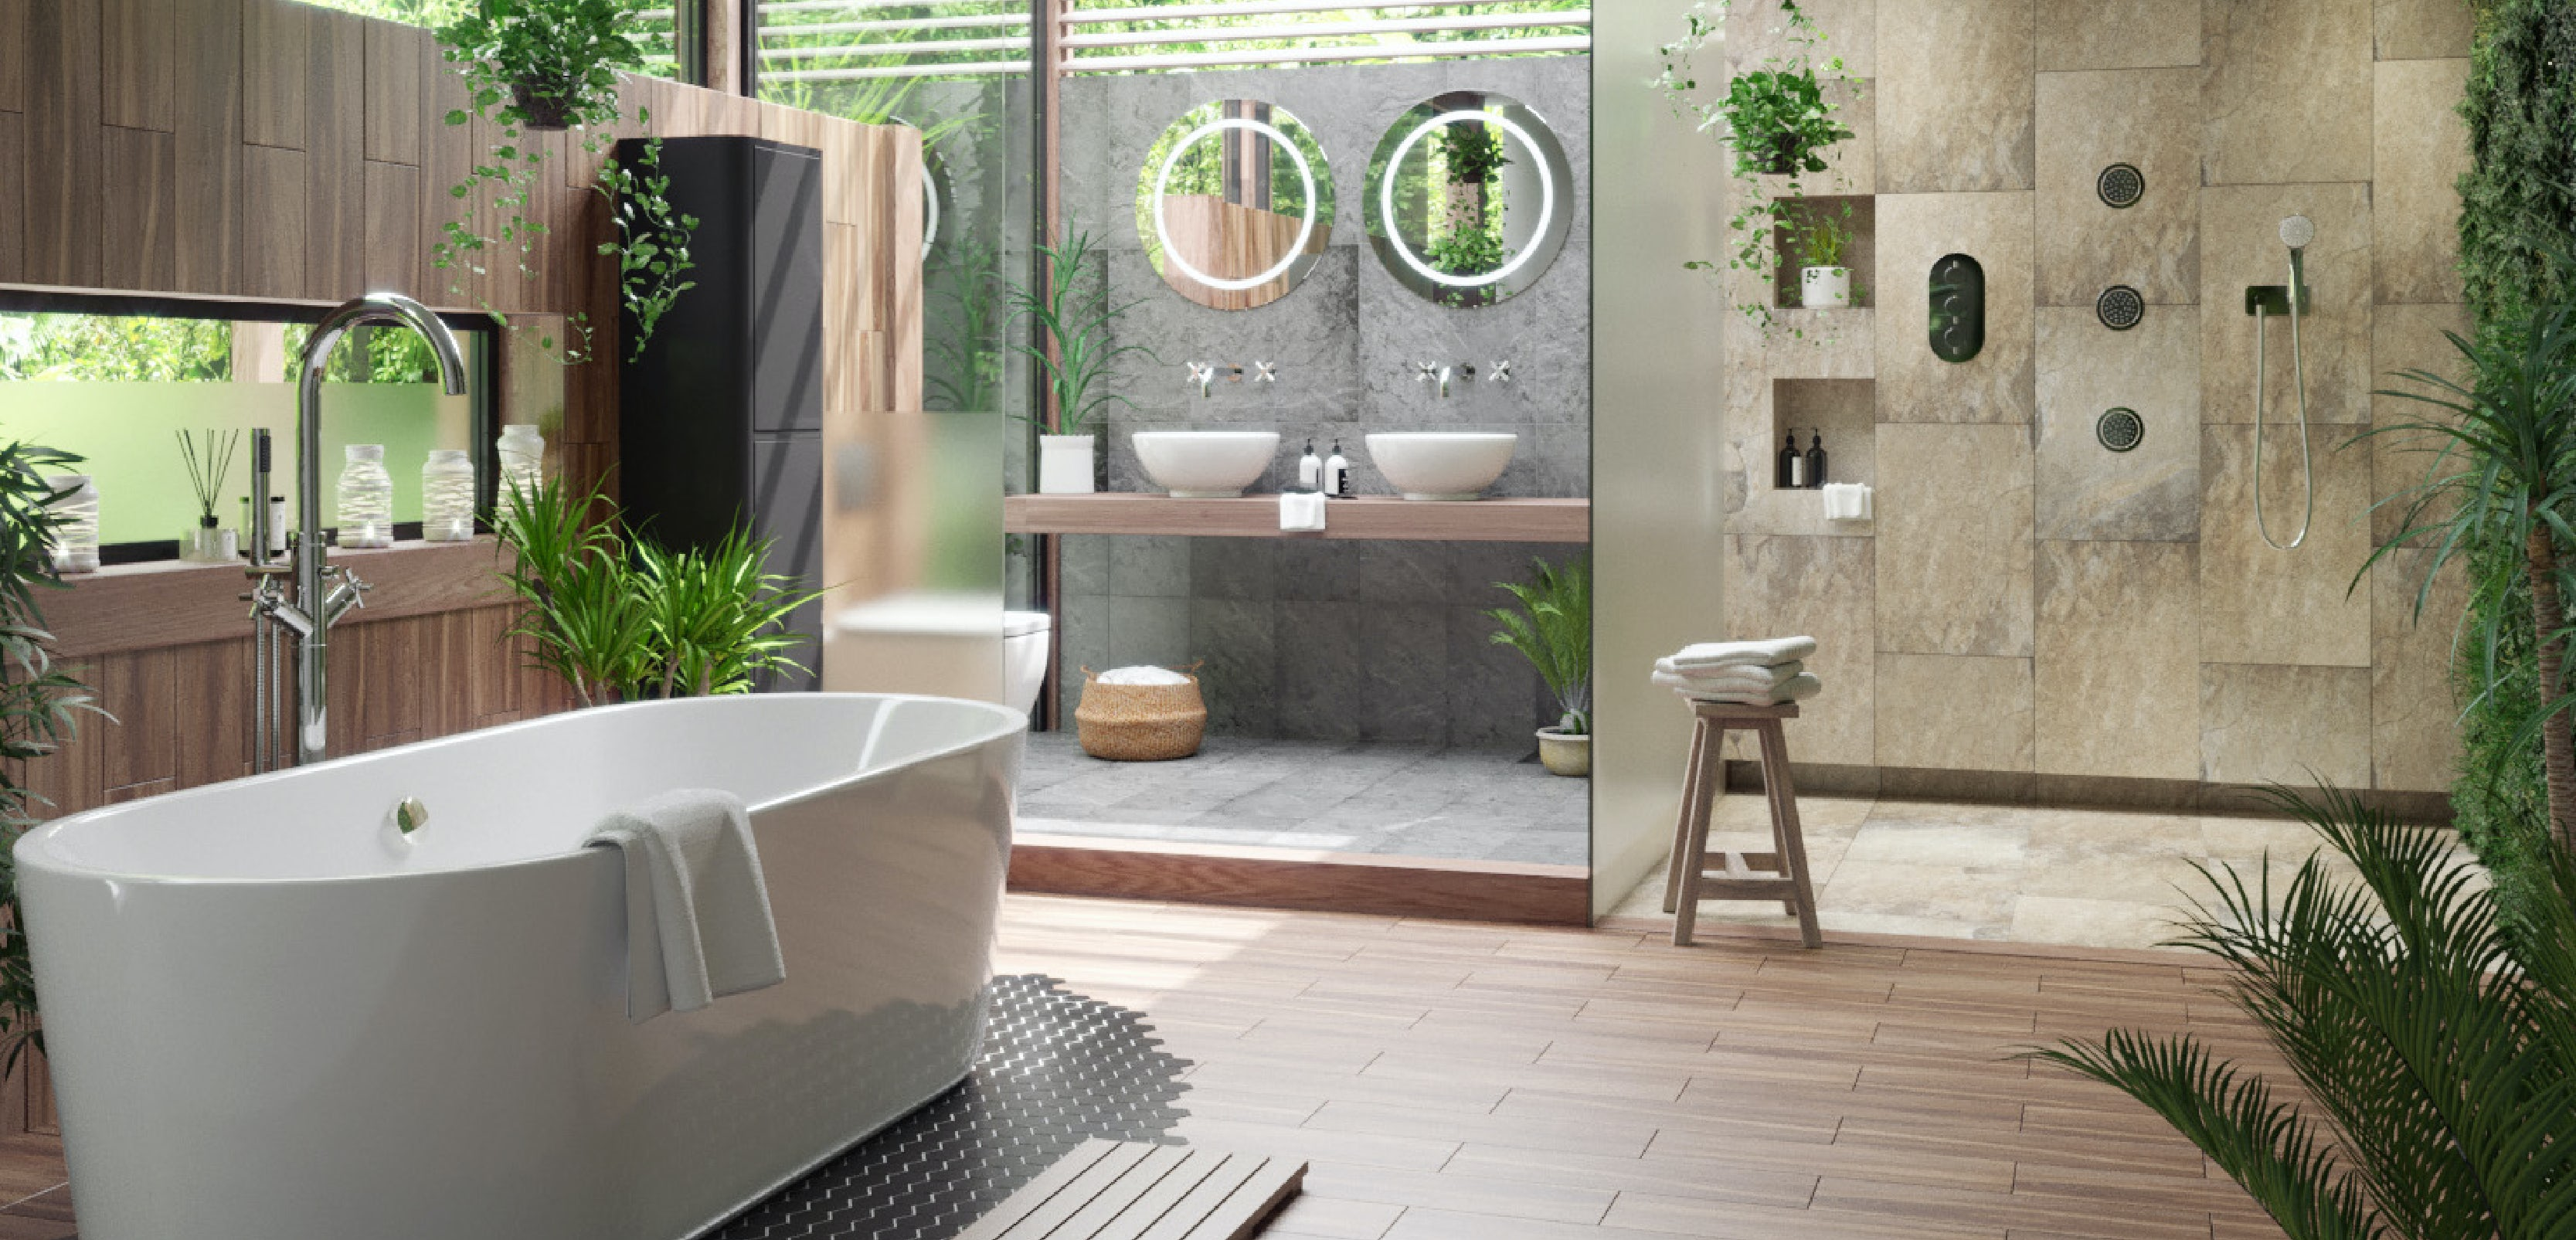 Bathroom Gallery Inspiration: Bathroom Ideas: Tropical Bathrooms